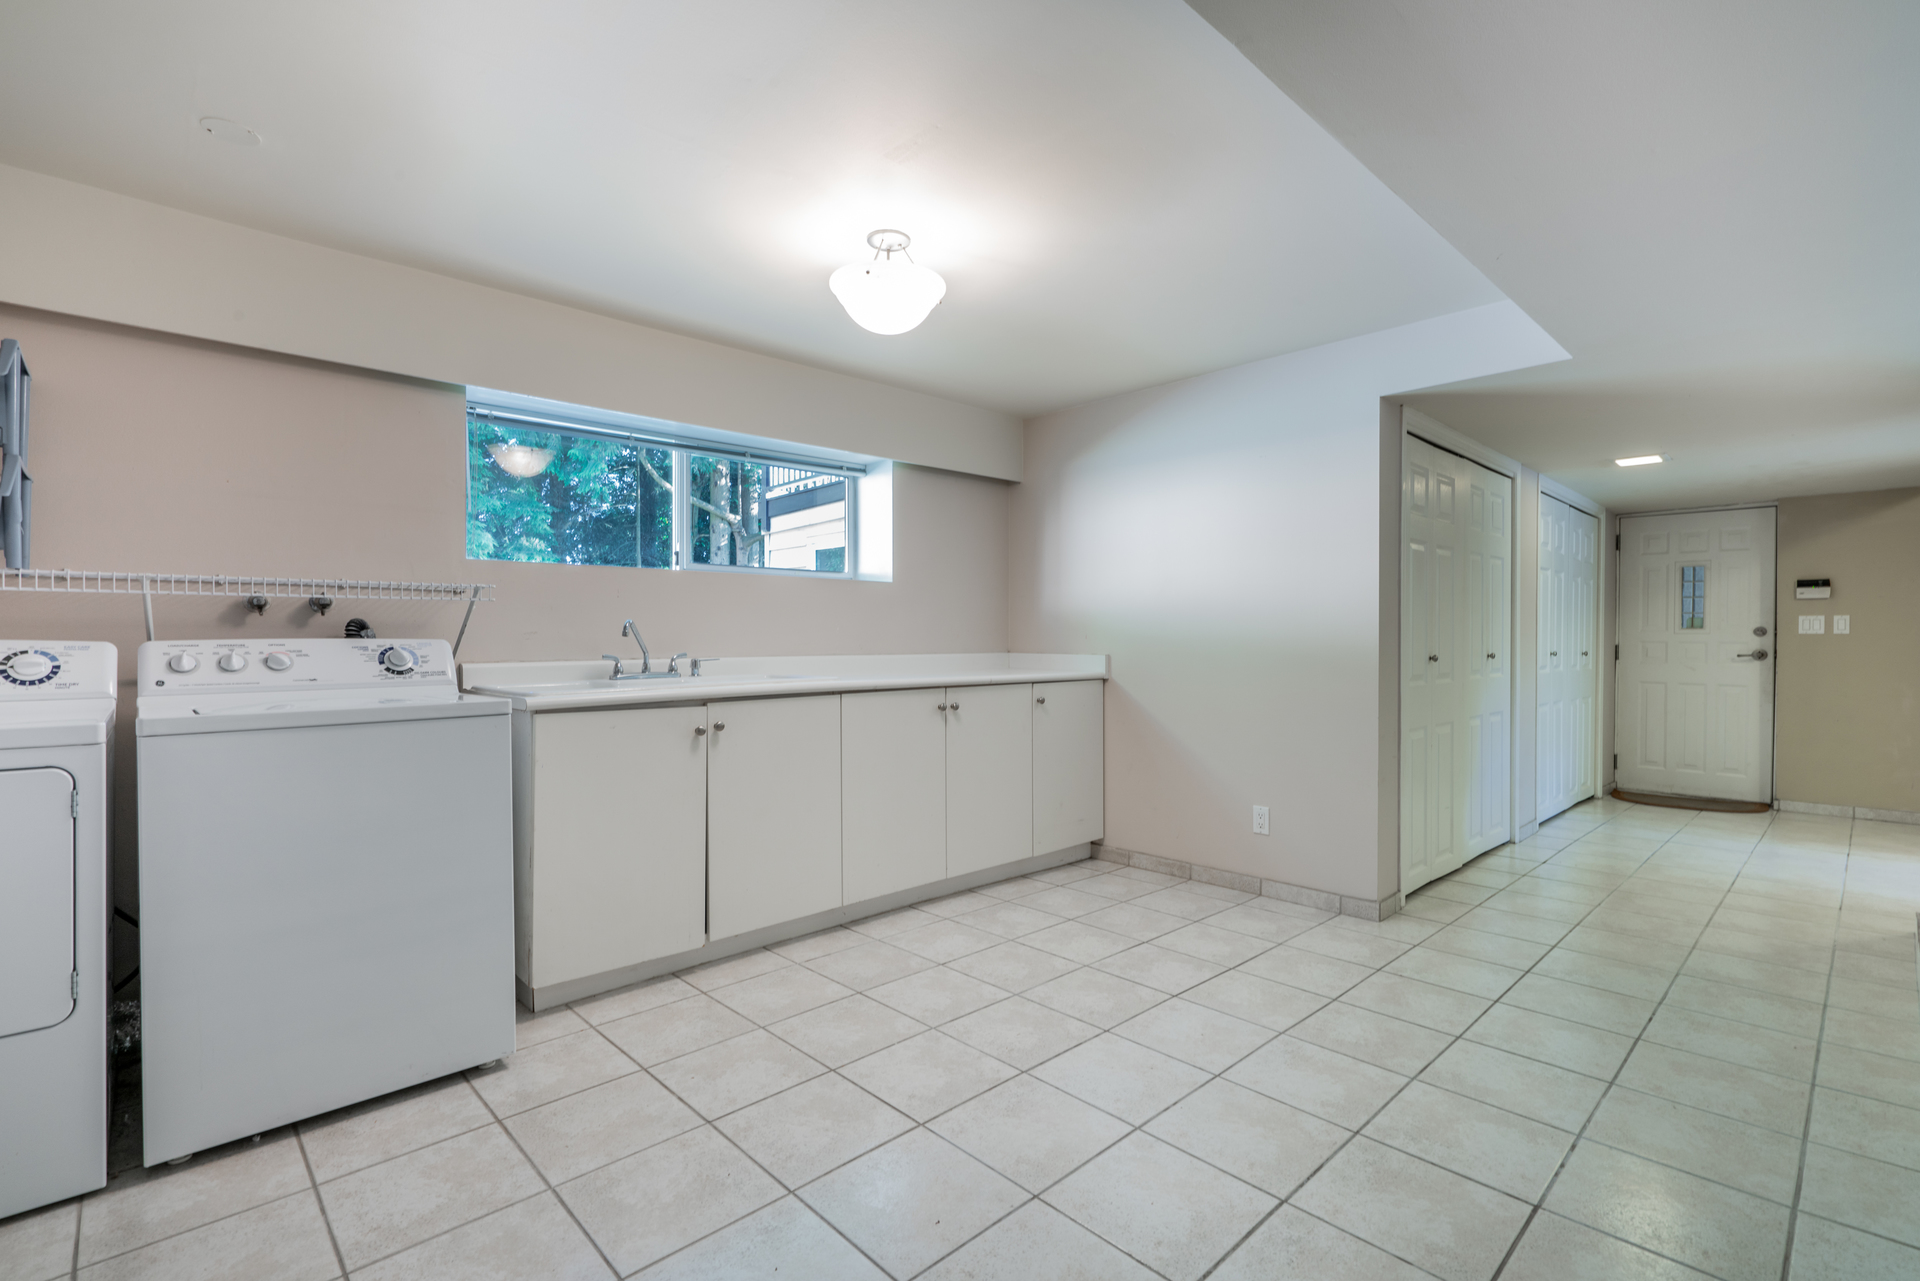 4034-delbrook-avenue-north-vancouver-33 at 4034 Delbrook Avenue, Upper Delbrook, North Vancouver